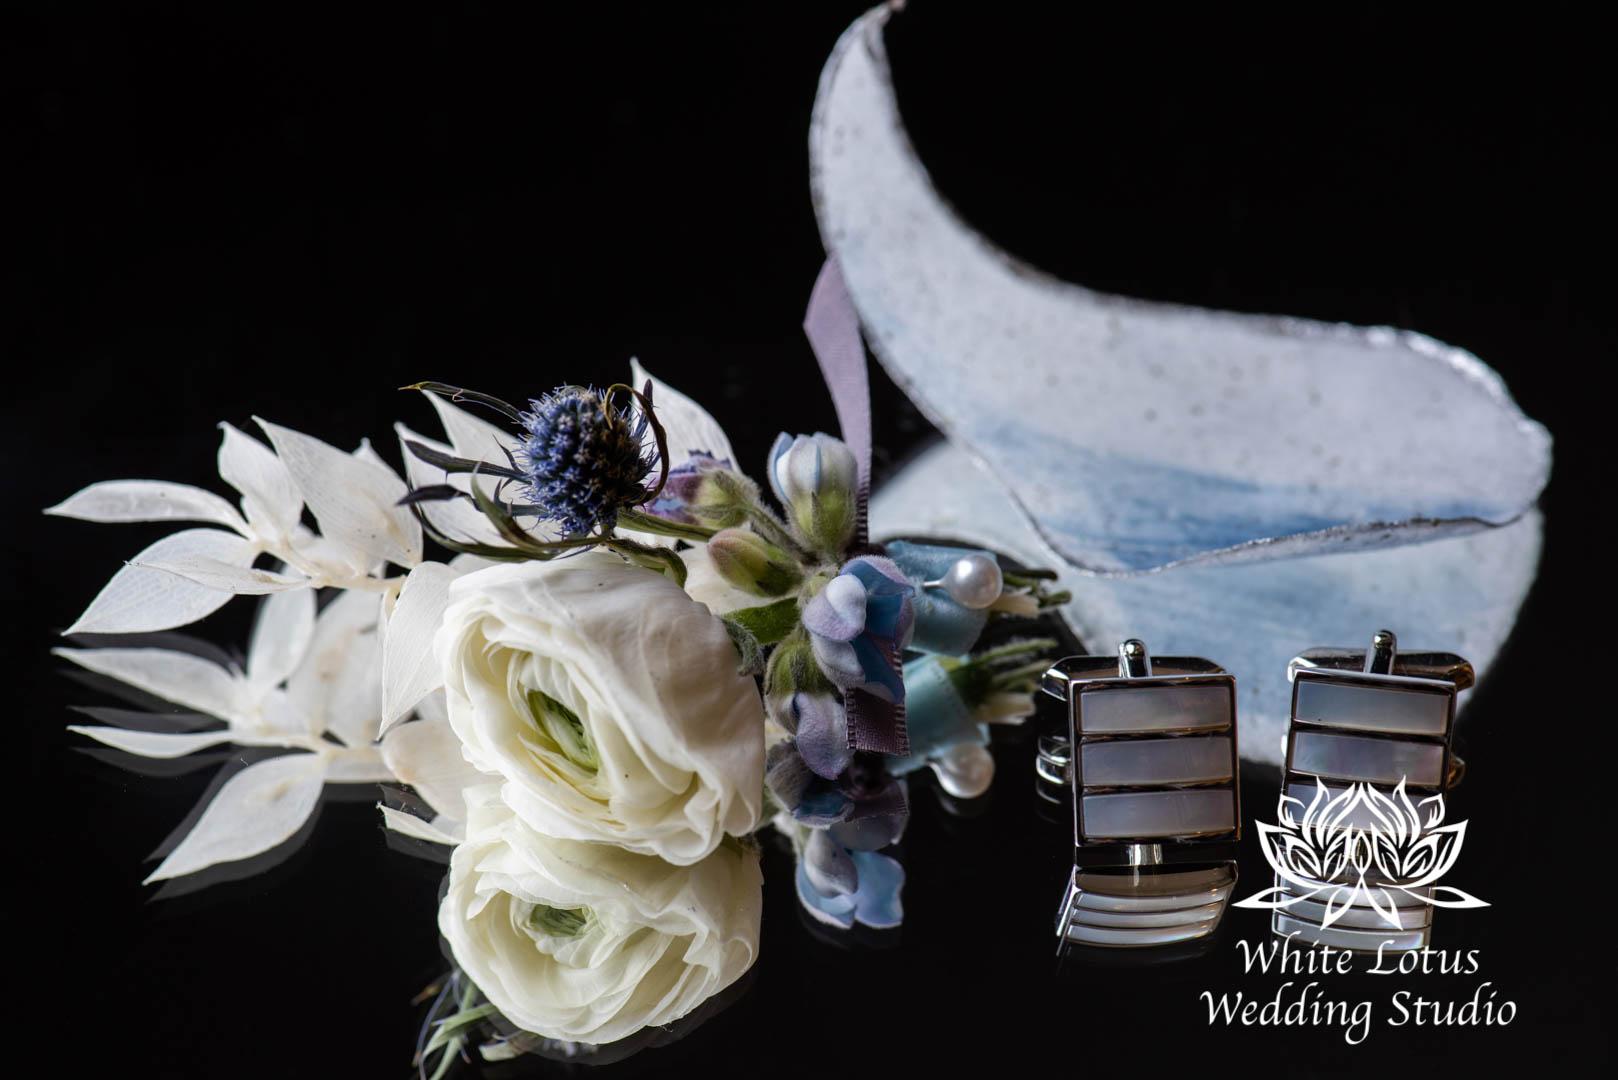 179- GLAM WINTERLUXE WEDDING INSPIRATION